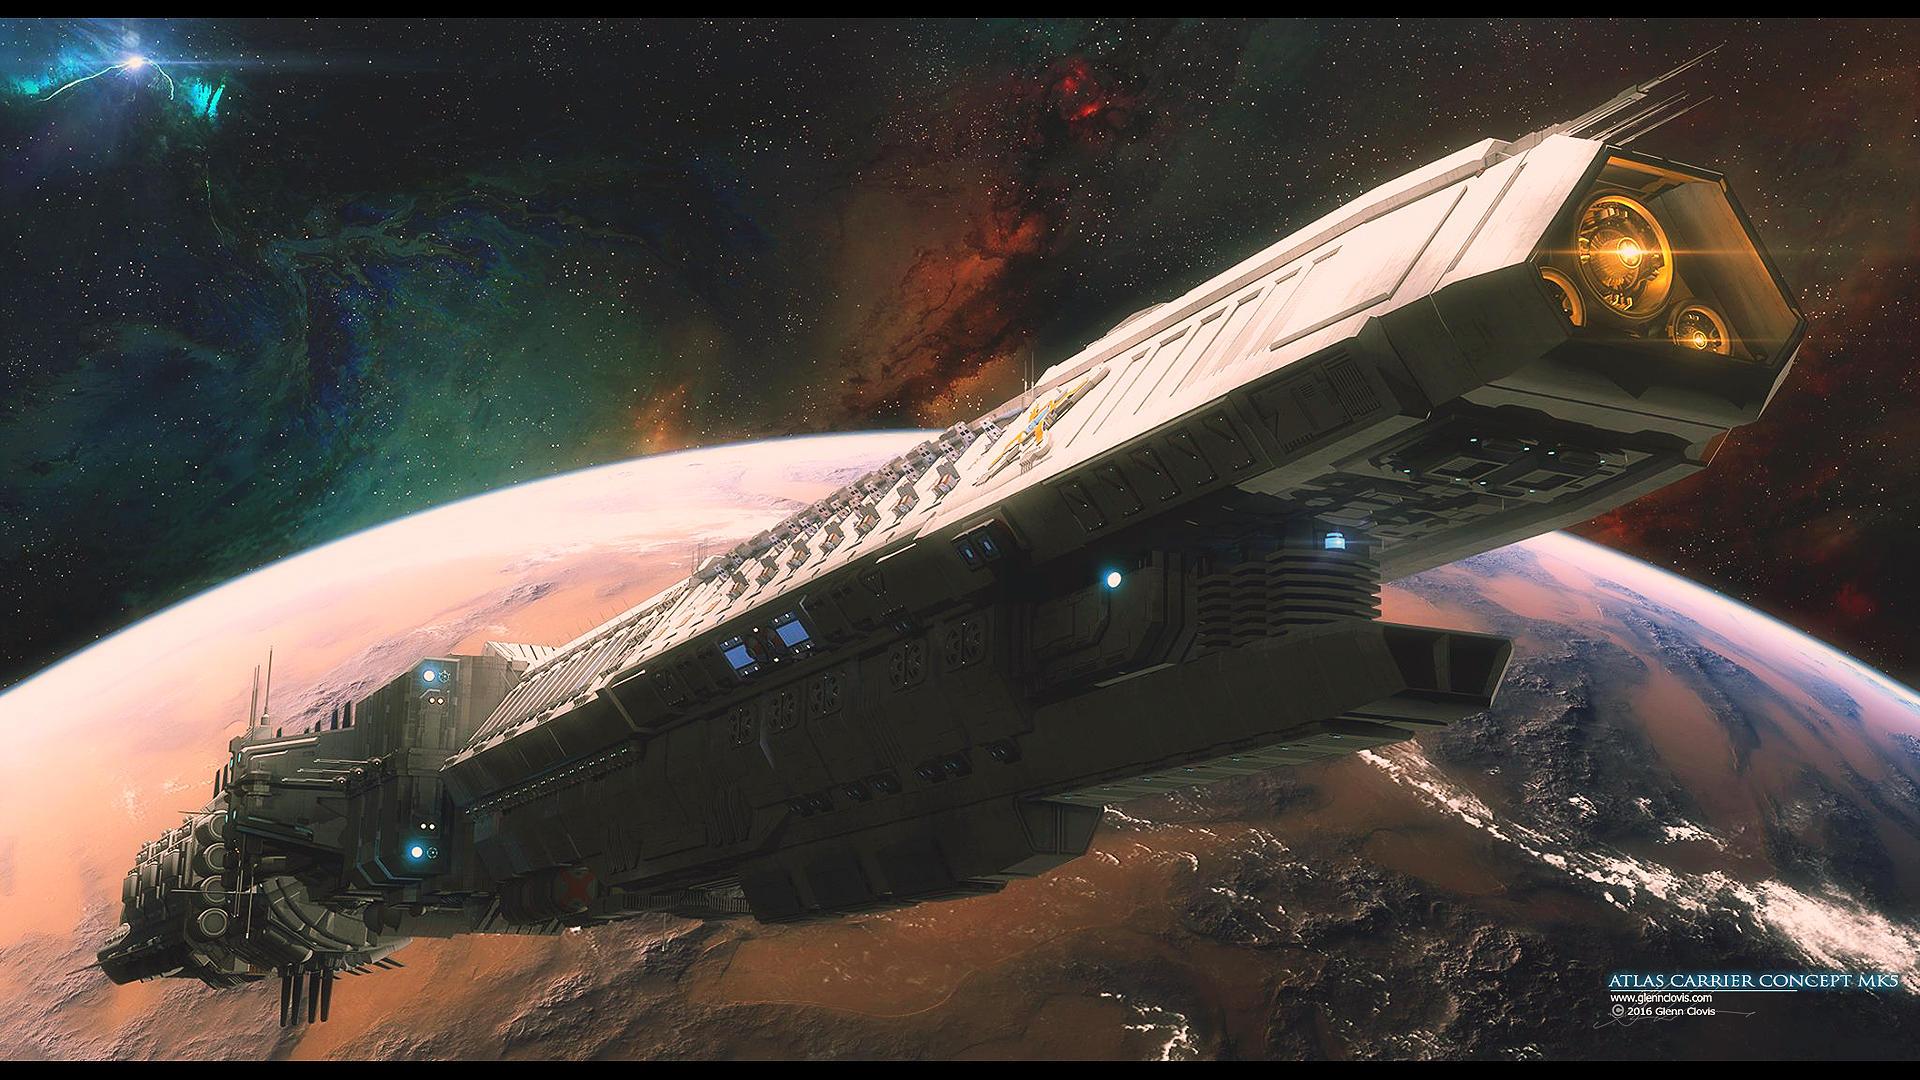 Atlas Carrier Concept MK5 by GlennClovis